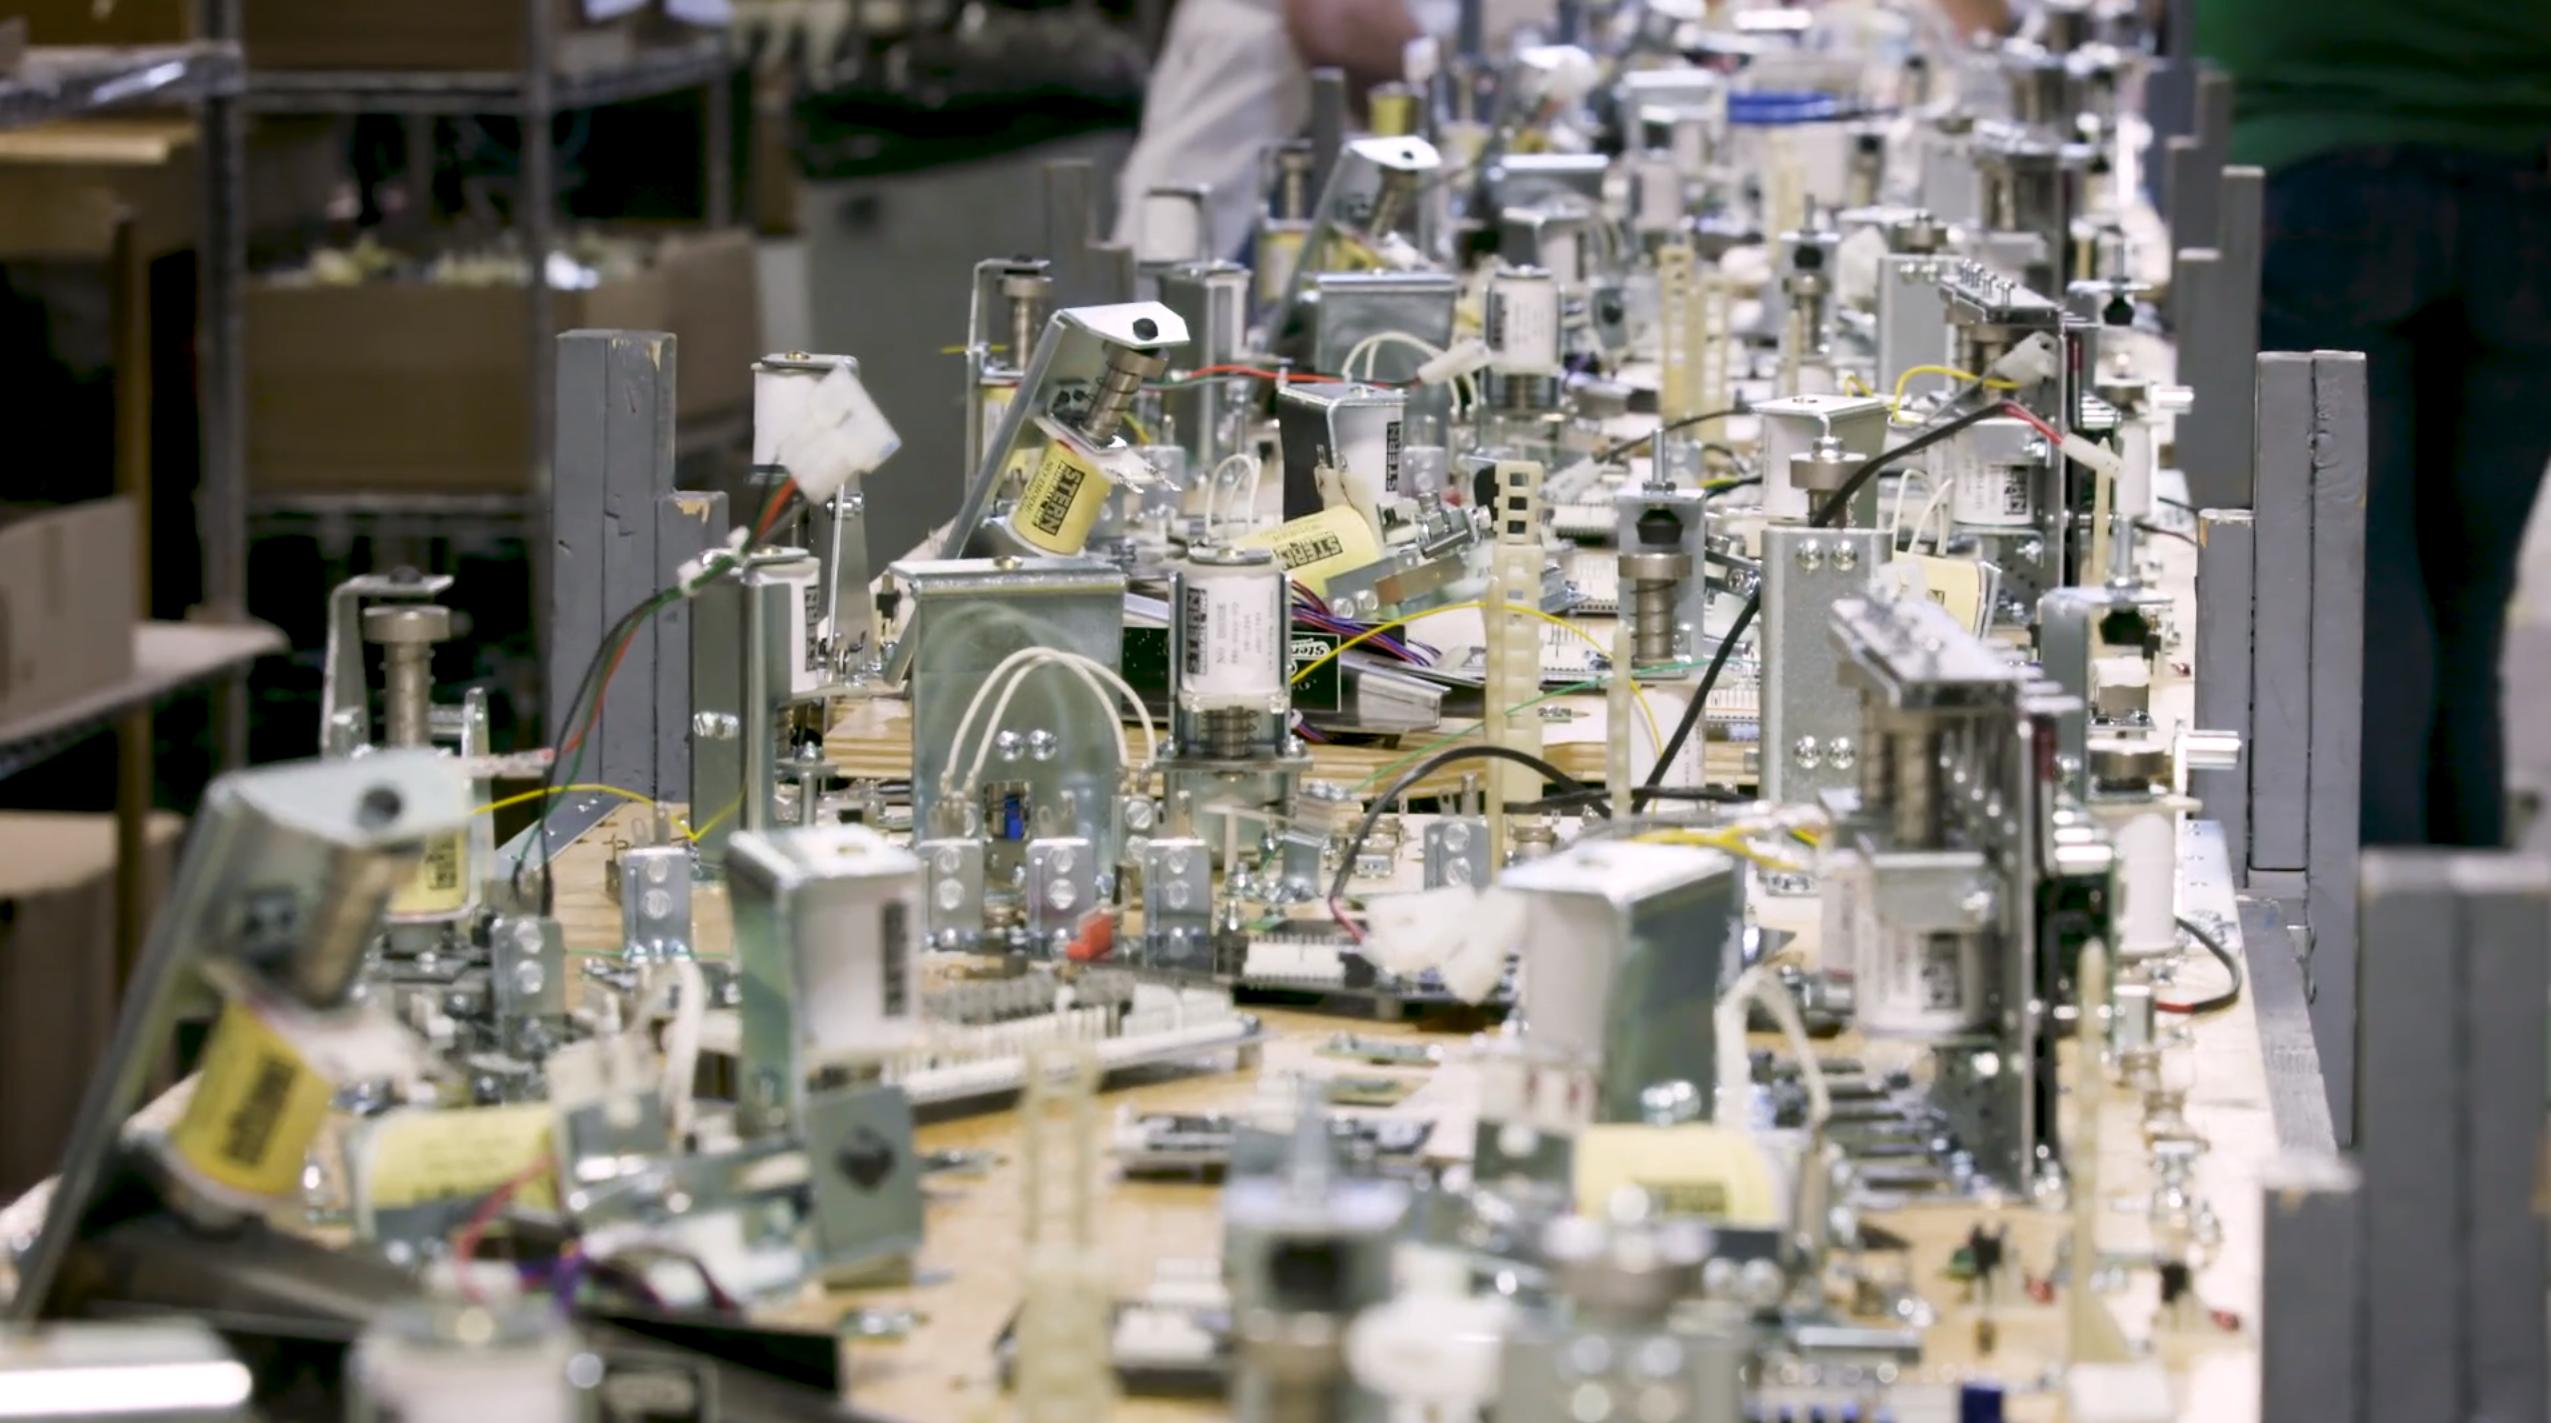 The Making of Star Wars Pinball Machines by Stern | #StarWars